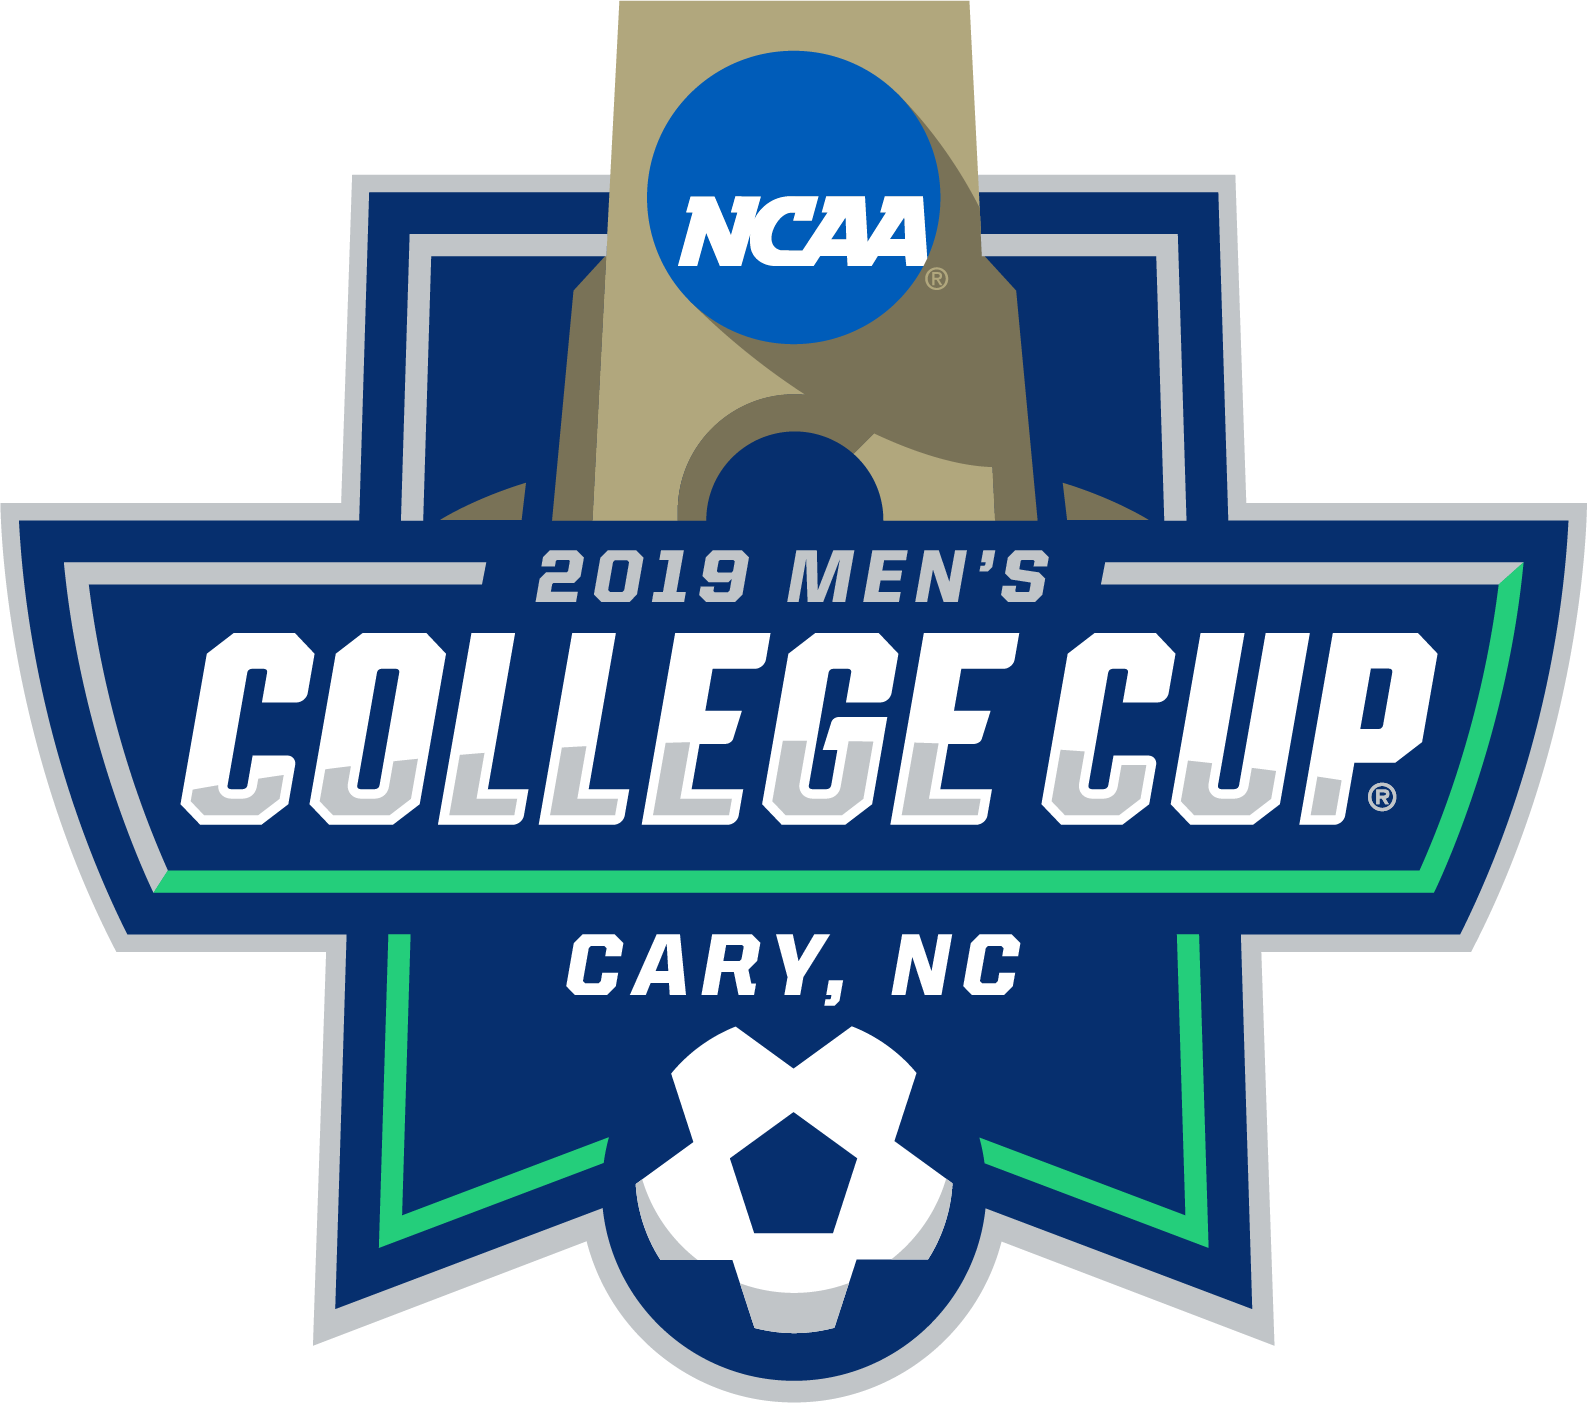 2019 MEN'S COLLEGE CUP